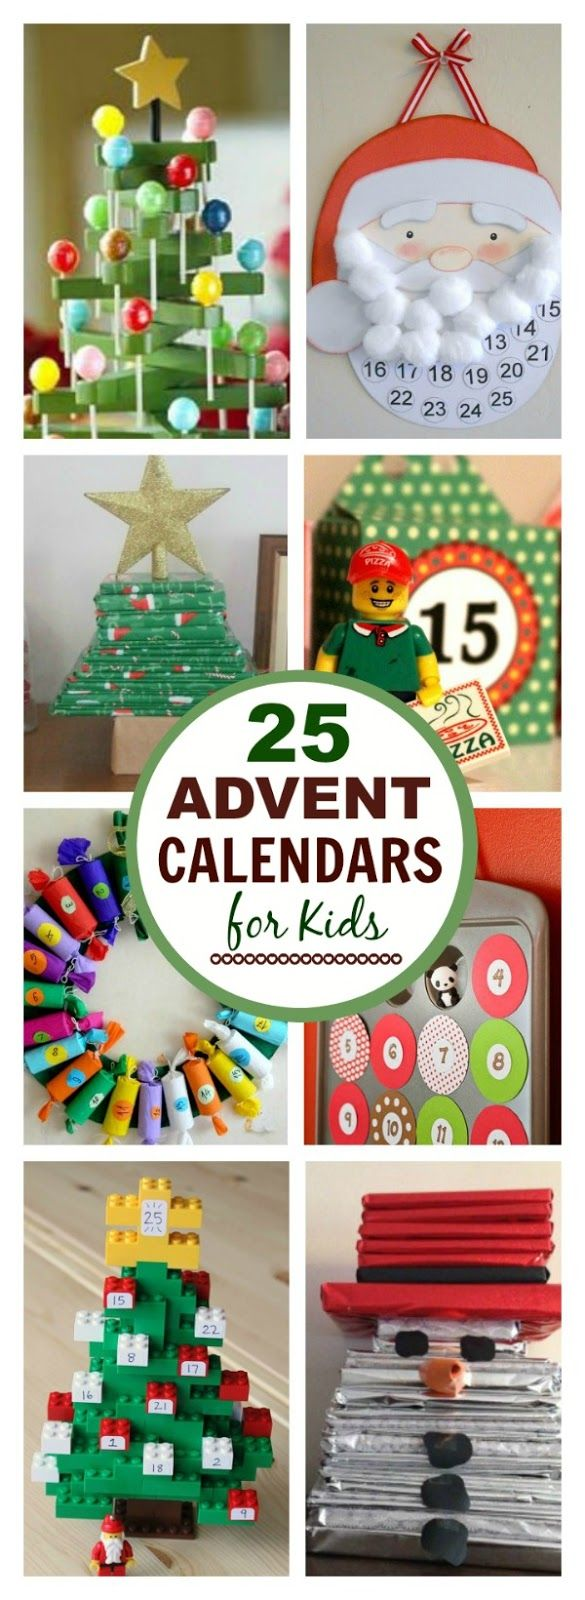 Diy Calendar Ideas For Preschool : Unique kids calendar ideas on pinterest for